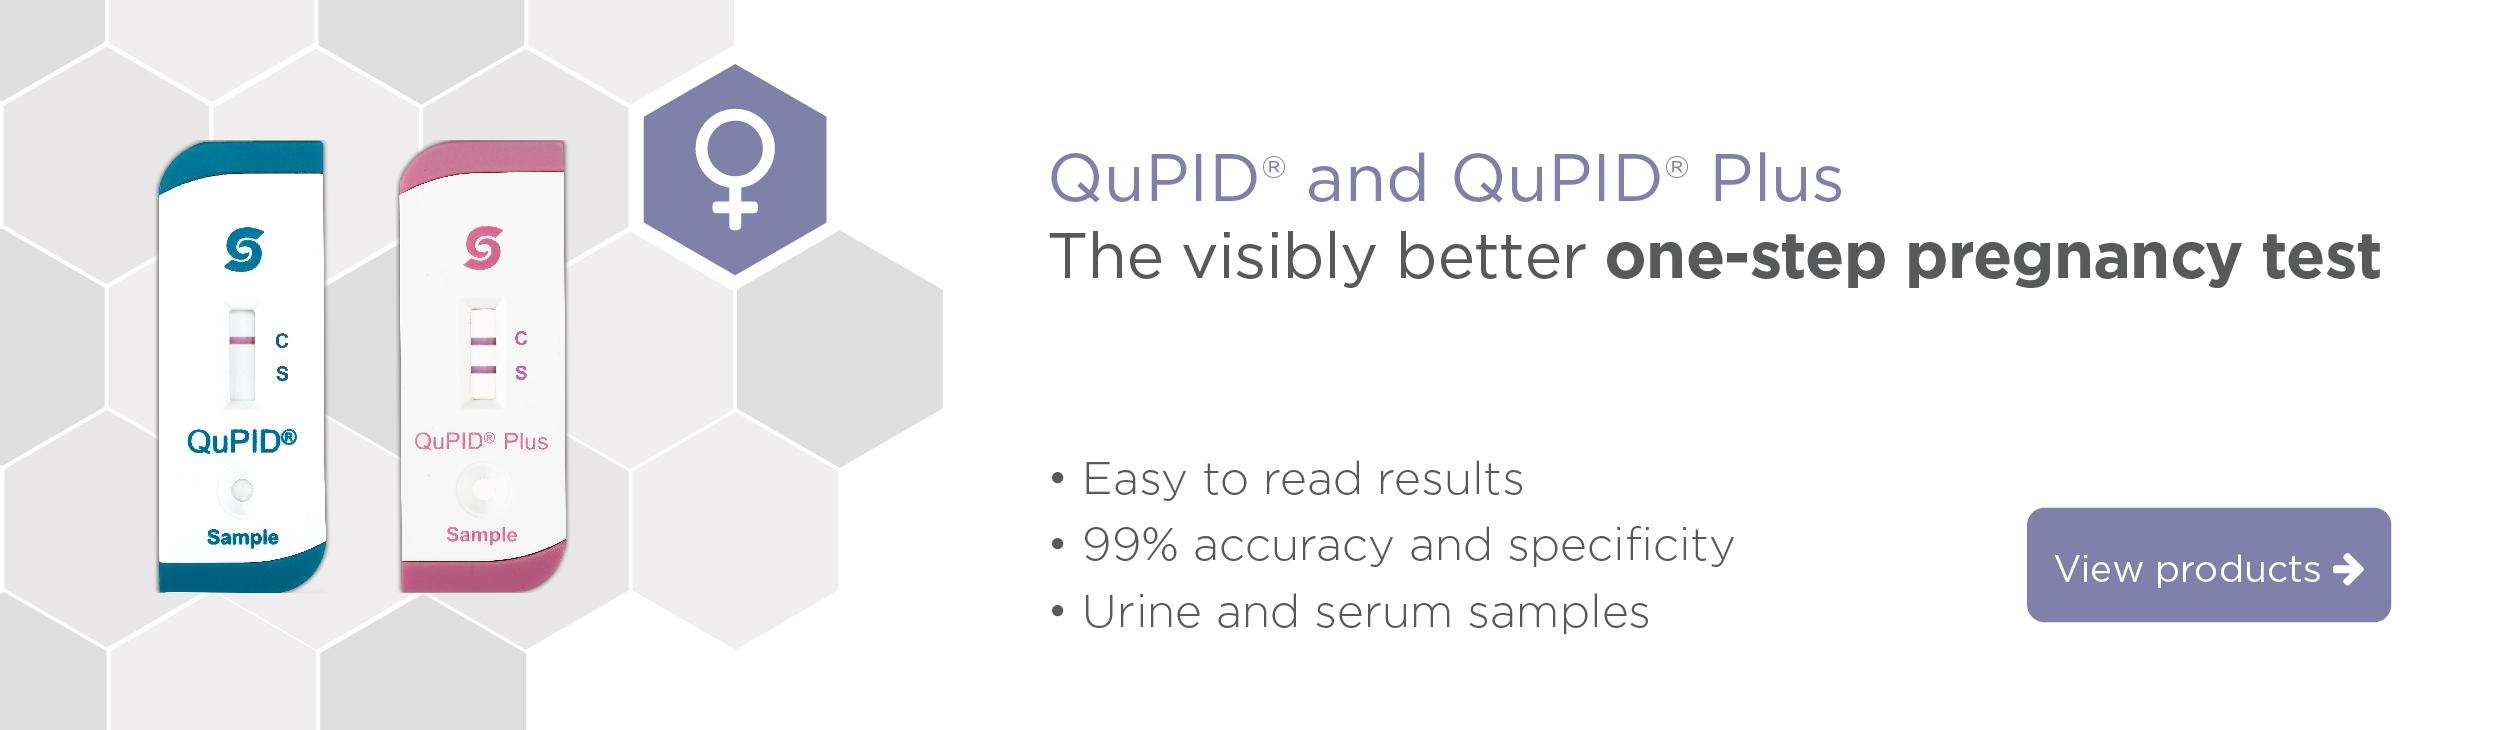 QuPID-one-step-pregnancy-test